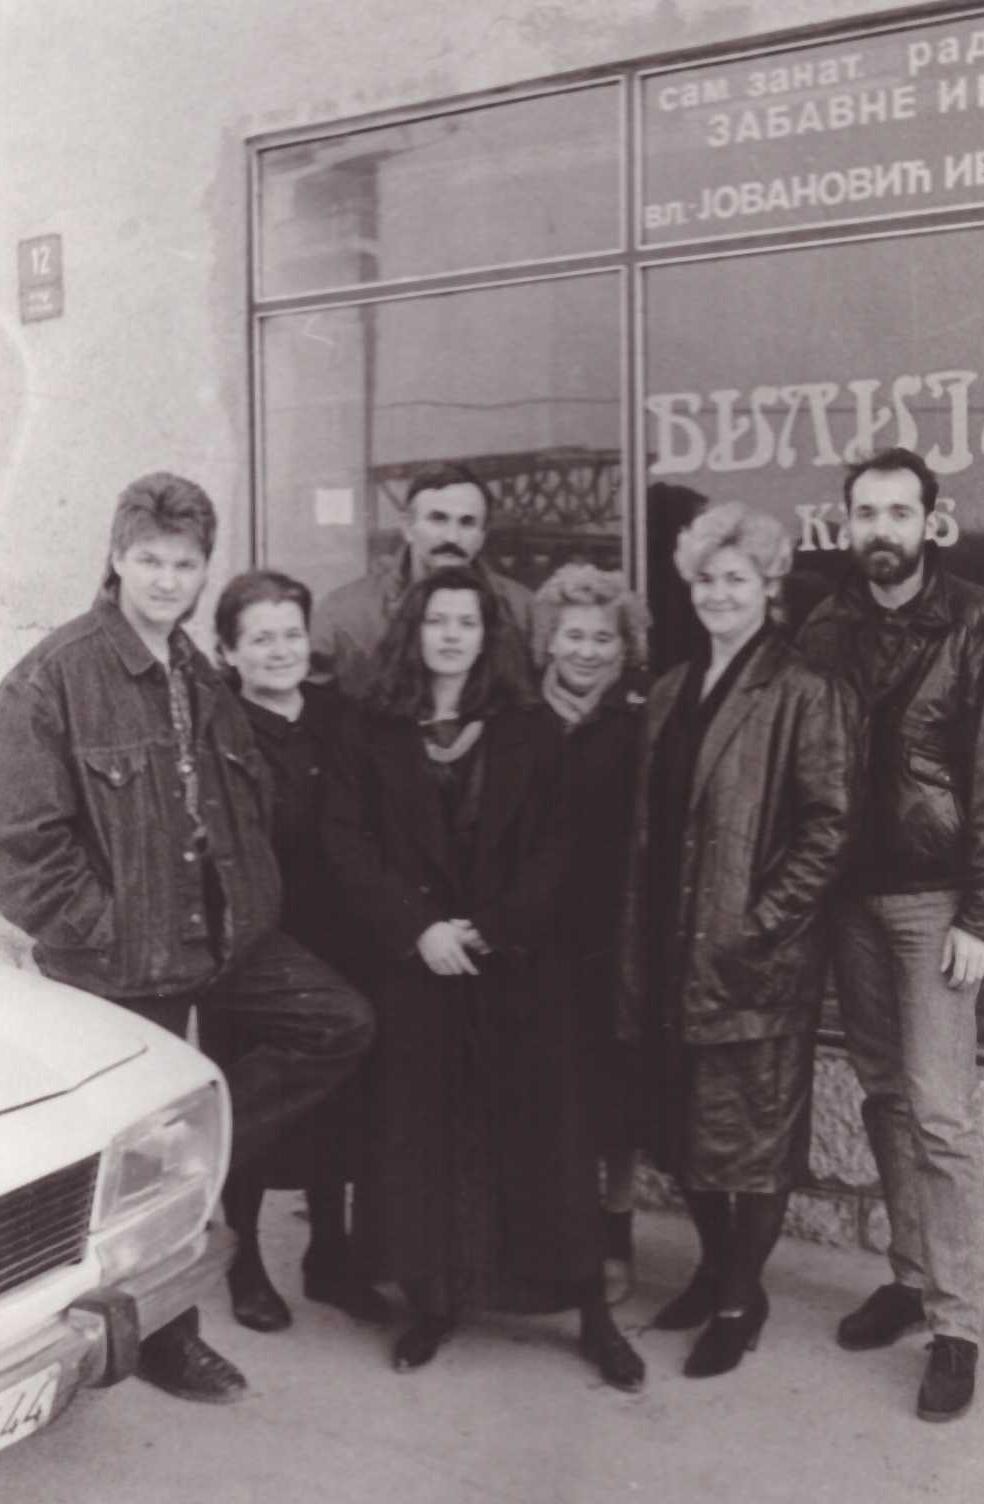 Pera Jovanović porodicom